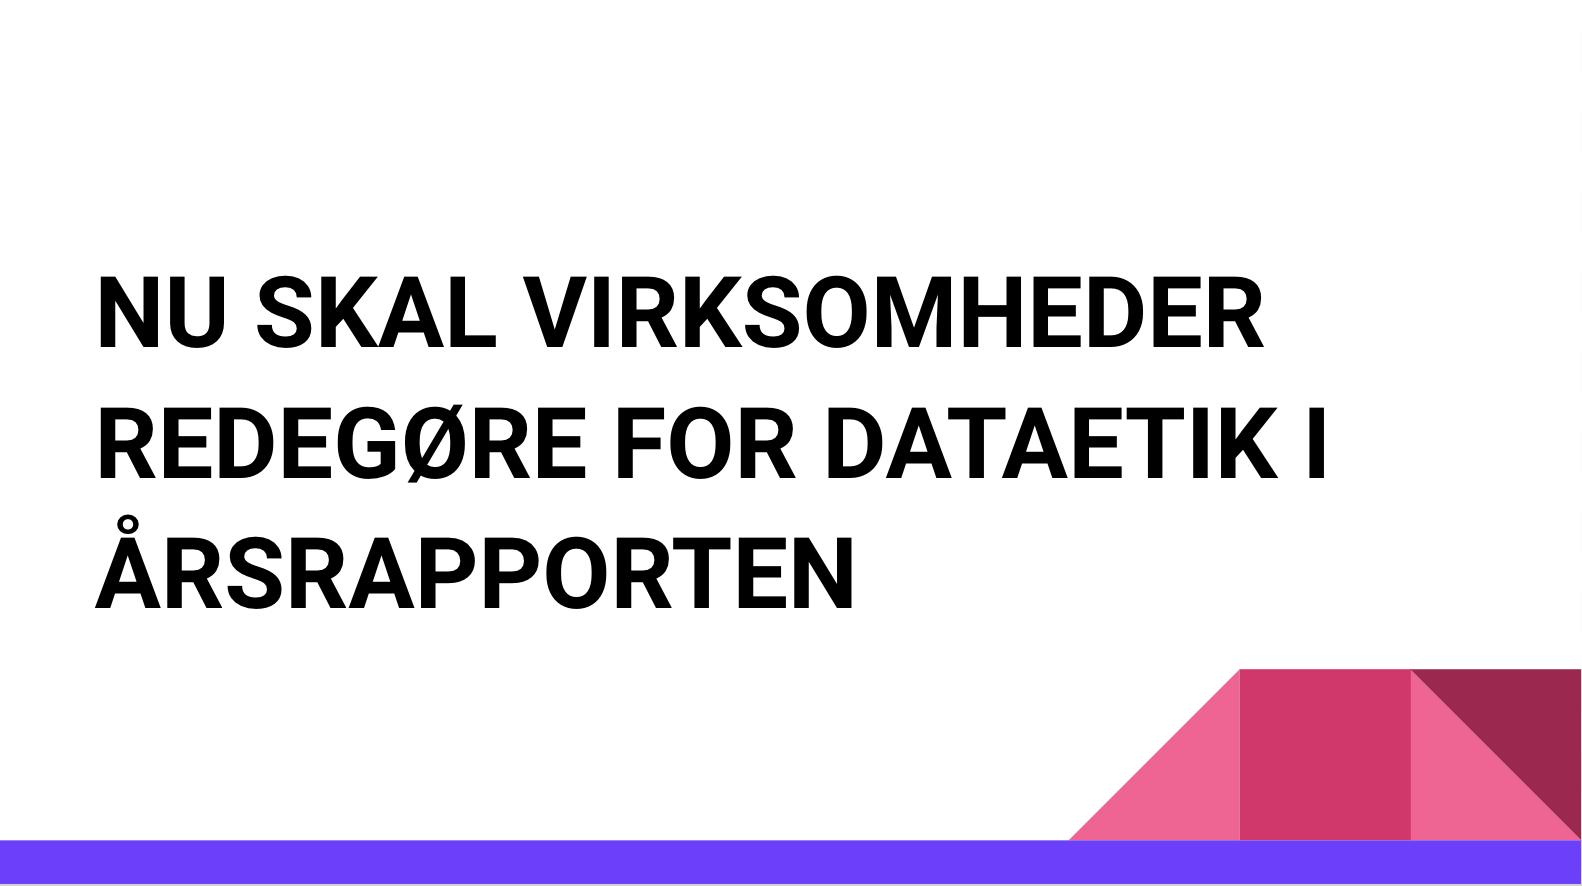 mandatory legislation for AI & data ethics introduced in Denmark